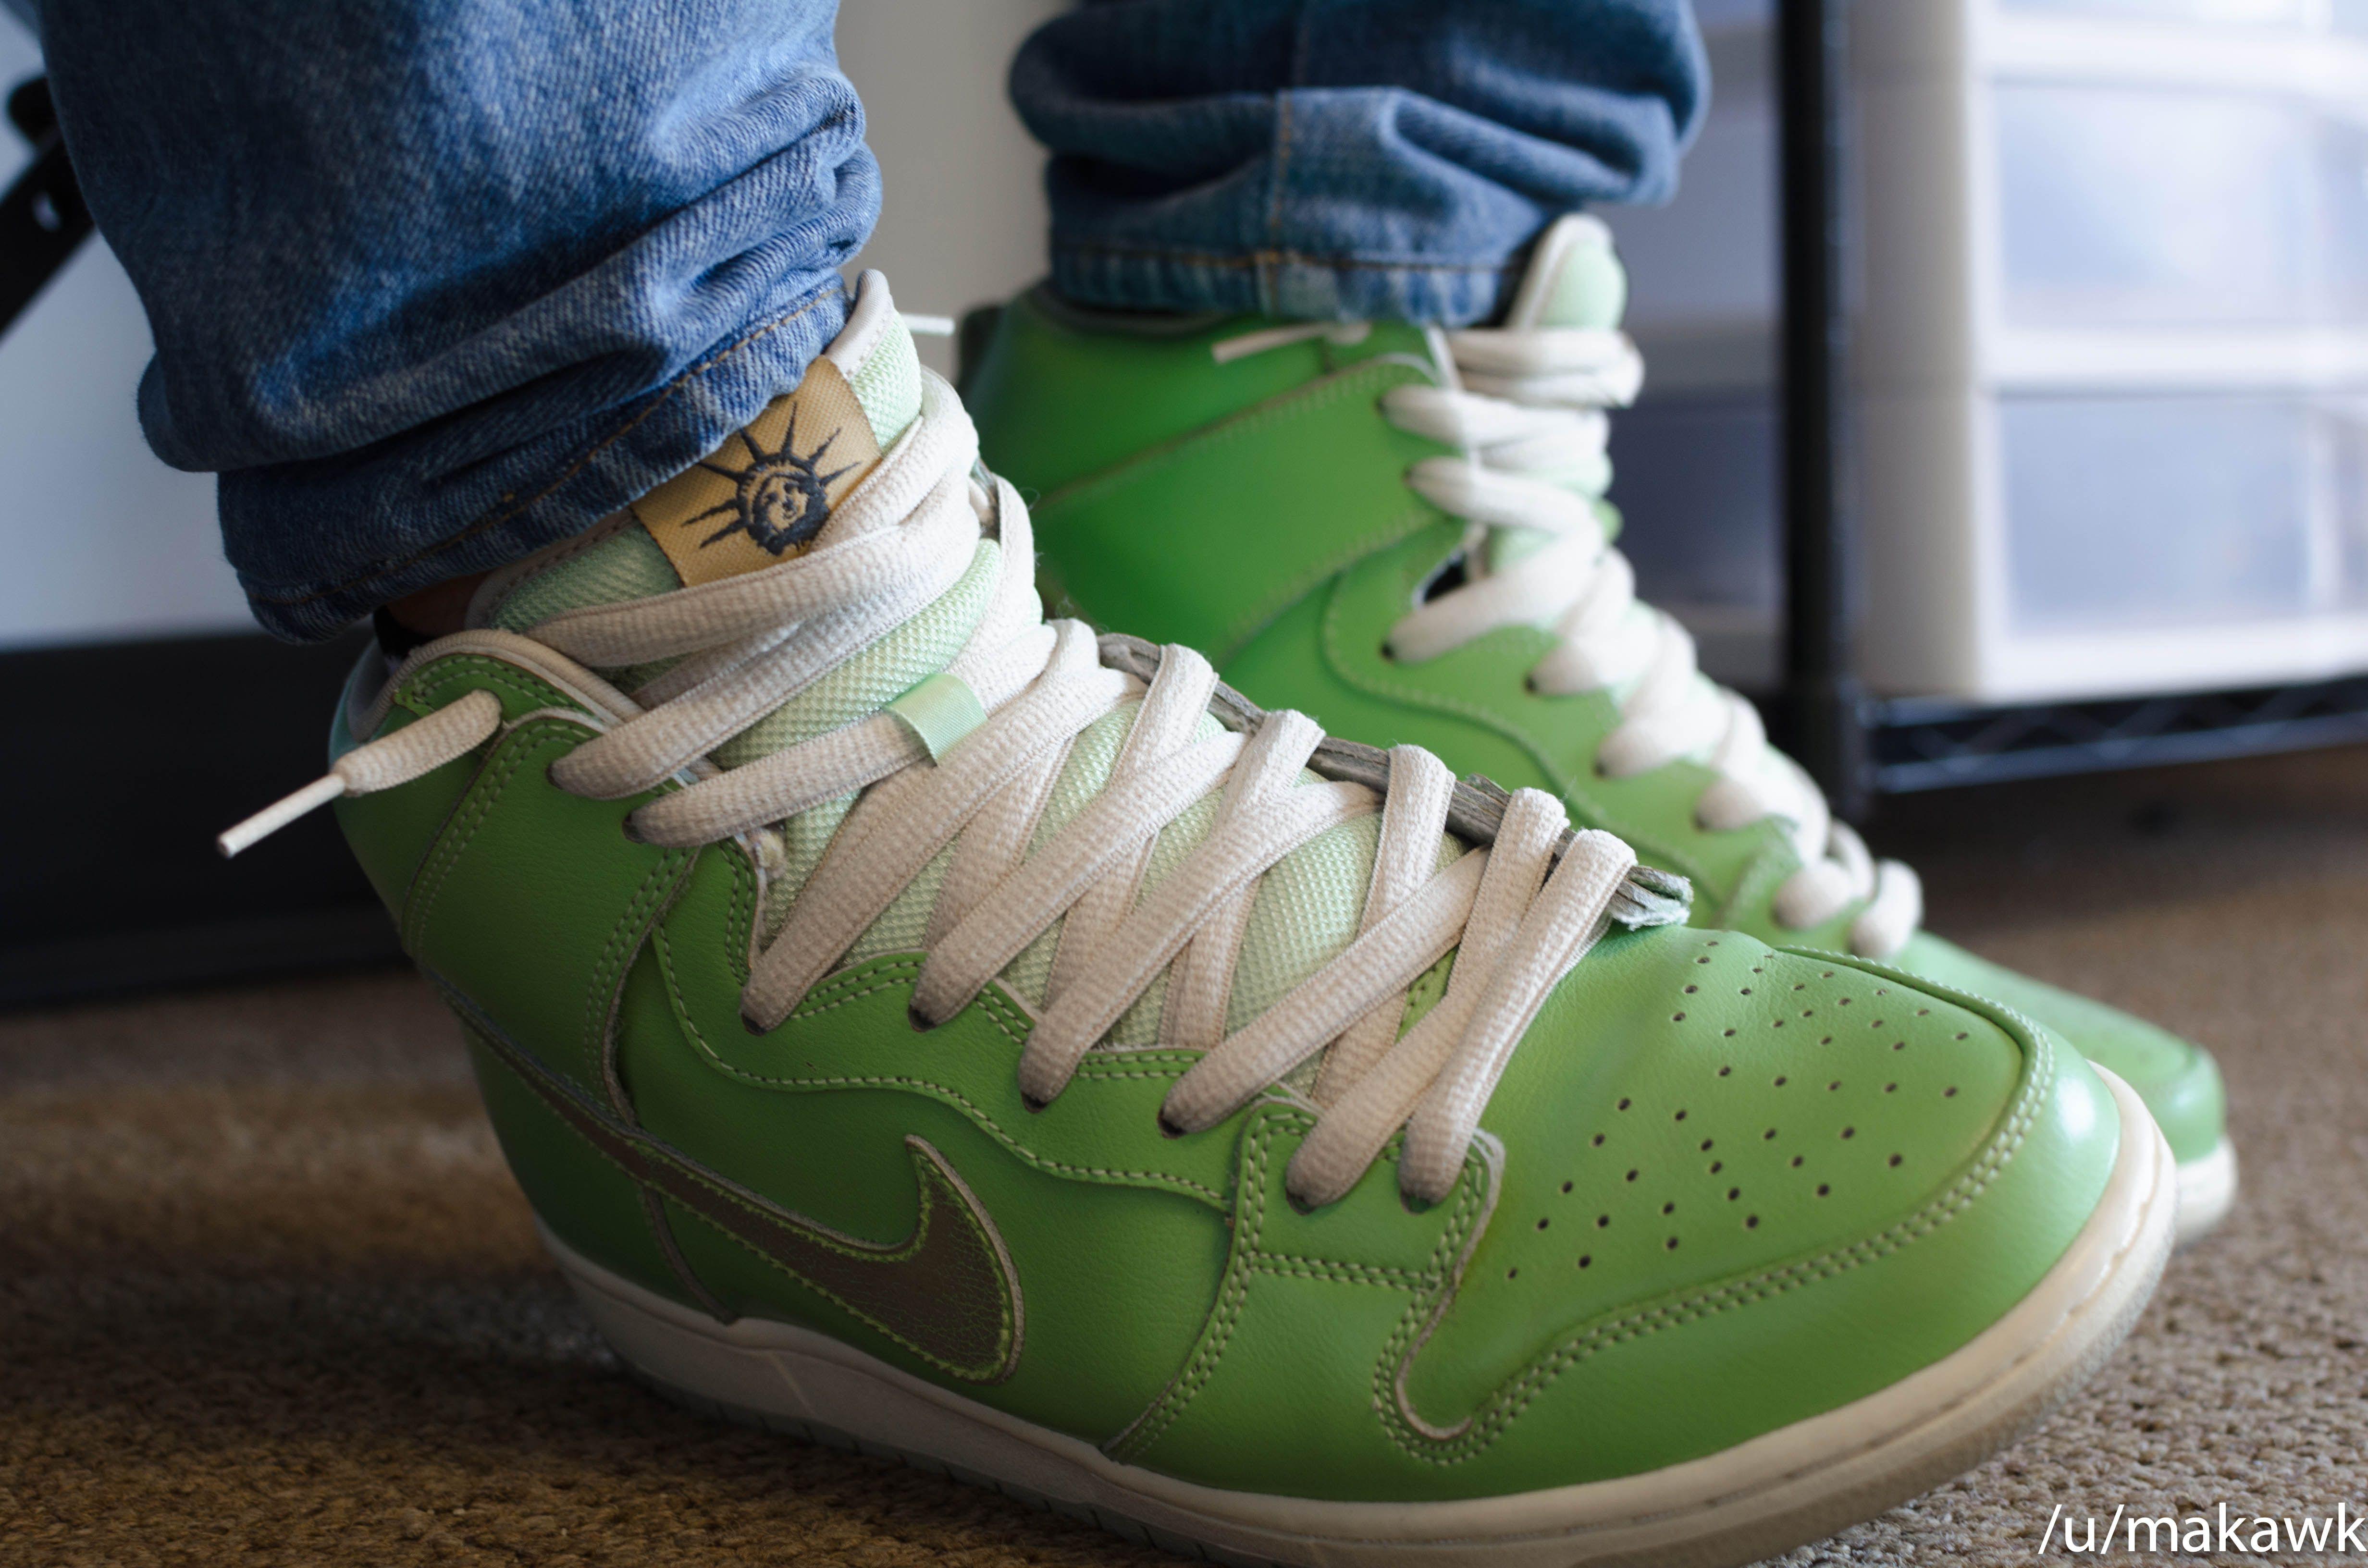 James Dyson Torment Applicable  WDYWT] Nike SB Statue of Liberty Dunks | Nike sb, Nike, Sneakers nike